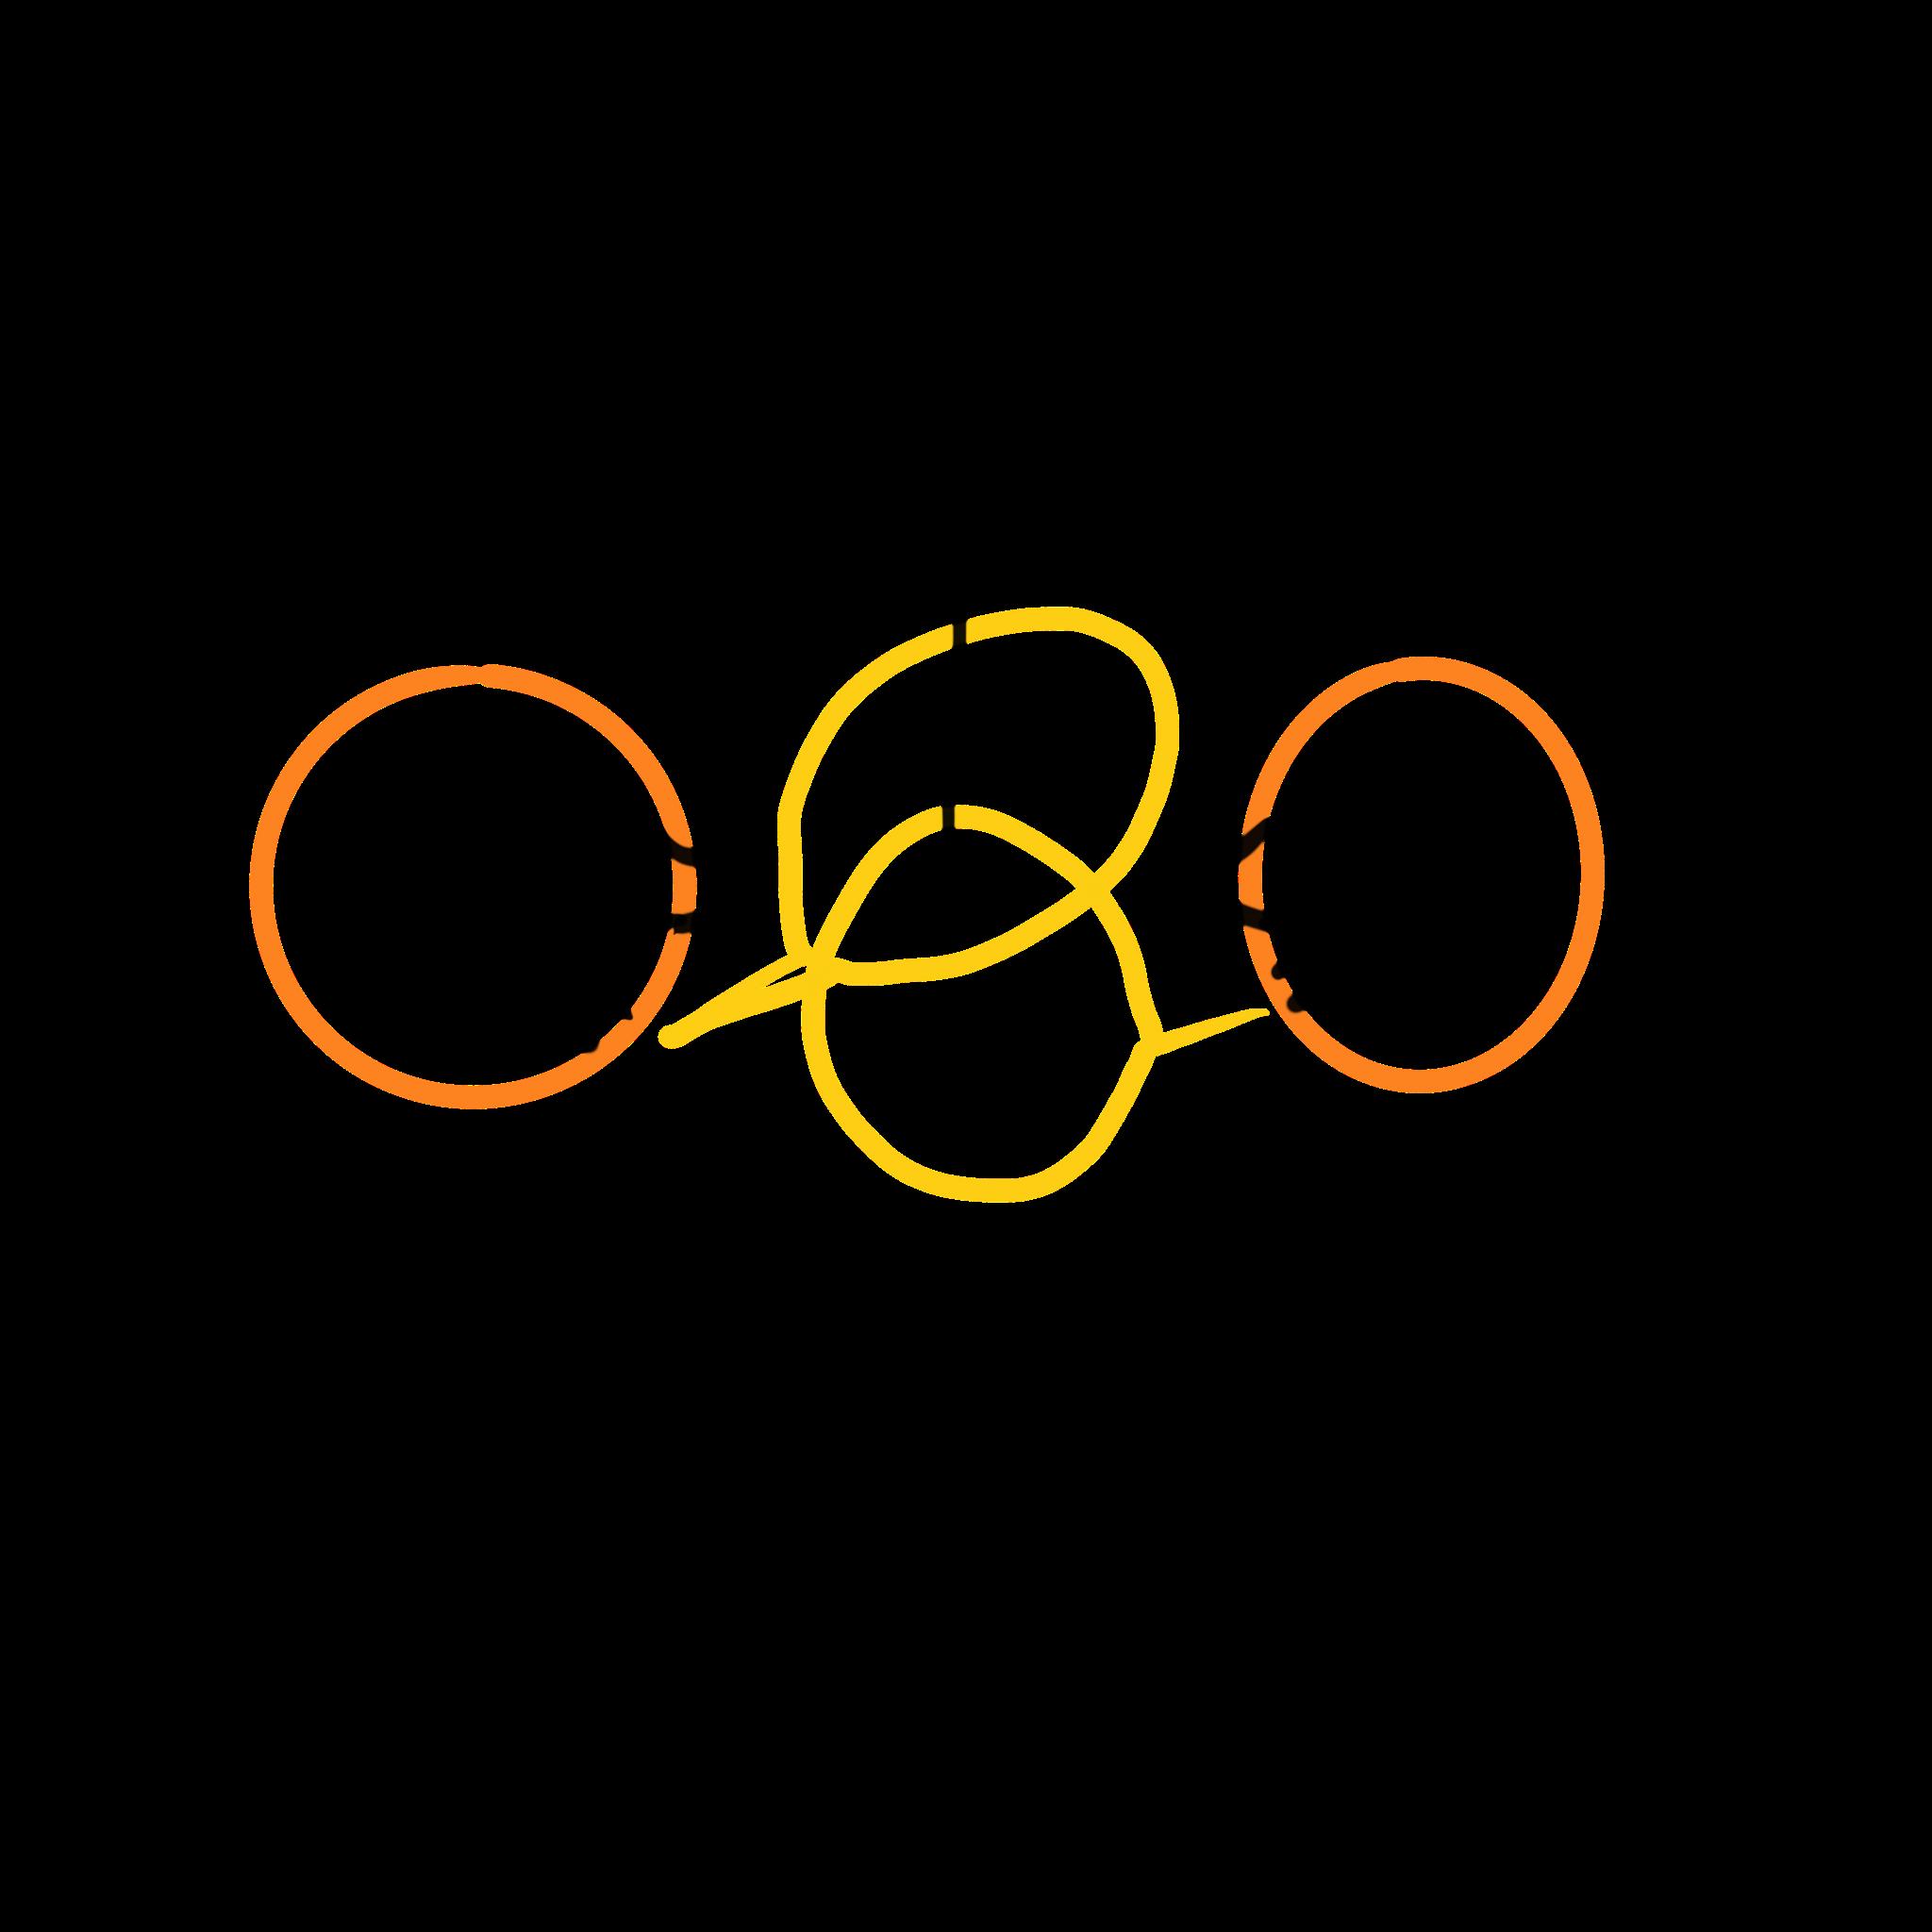 Opera_senza_titolo 7